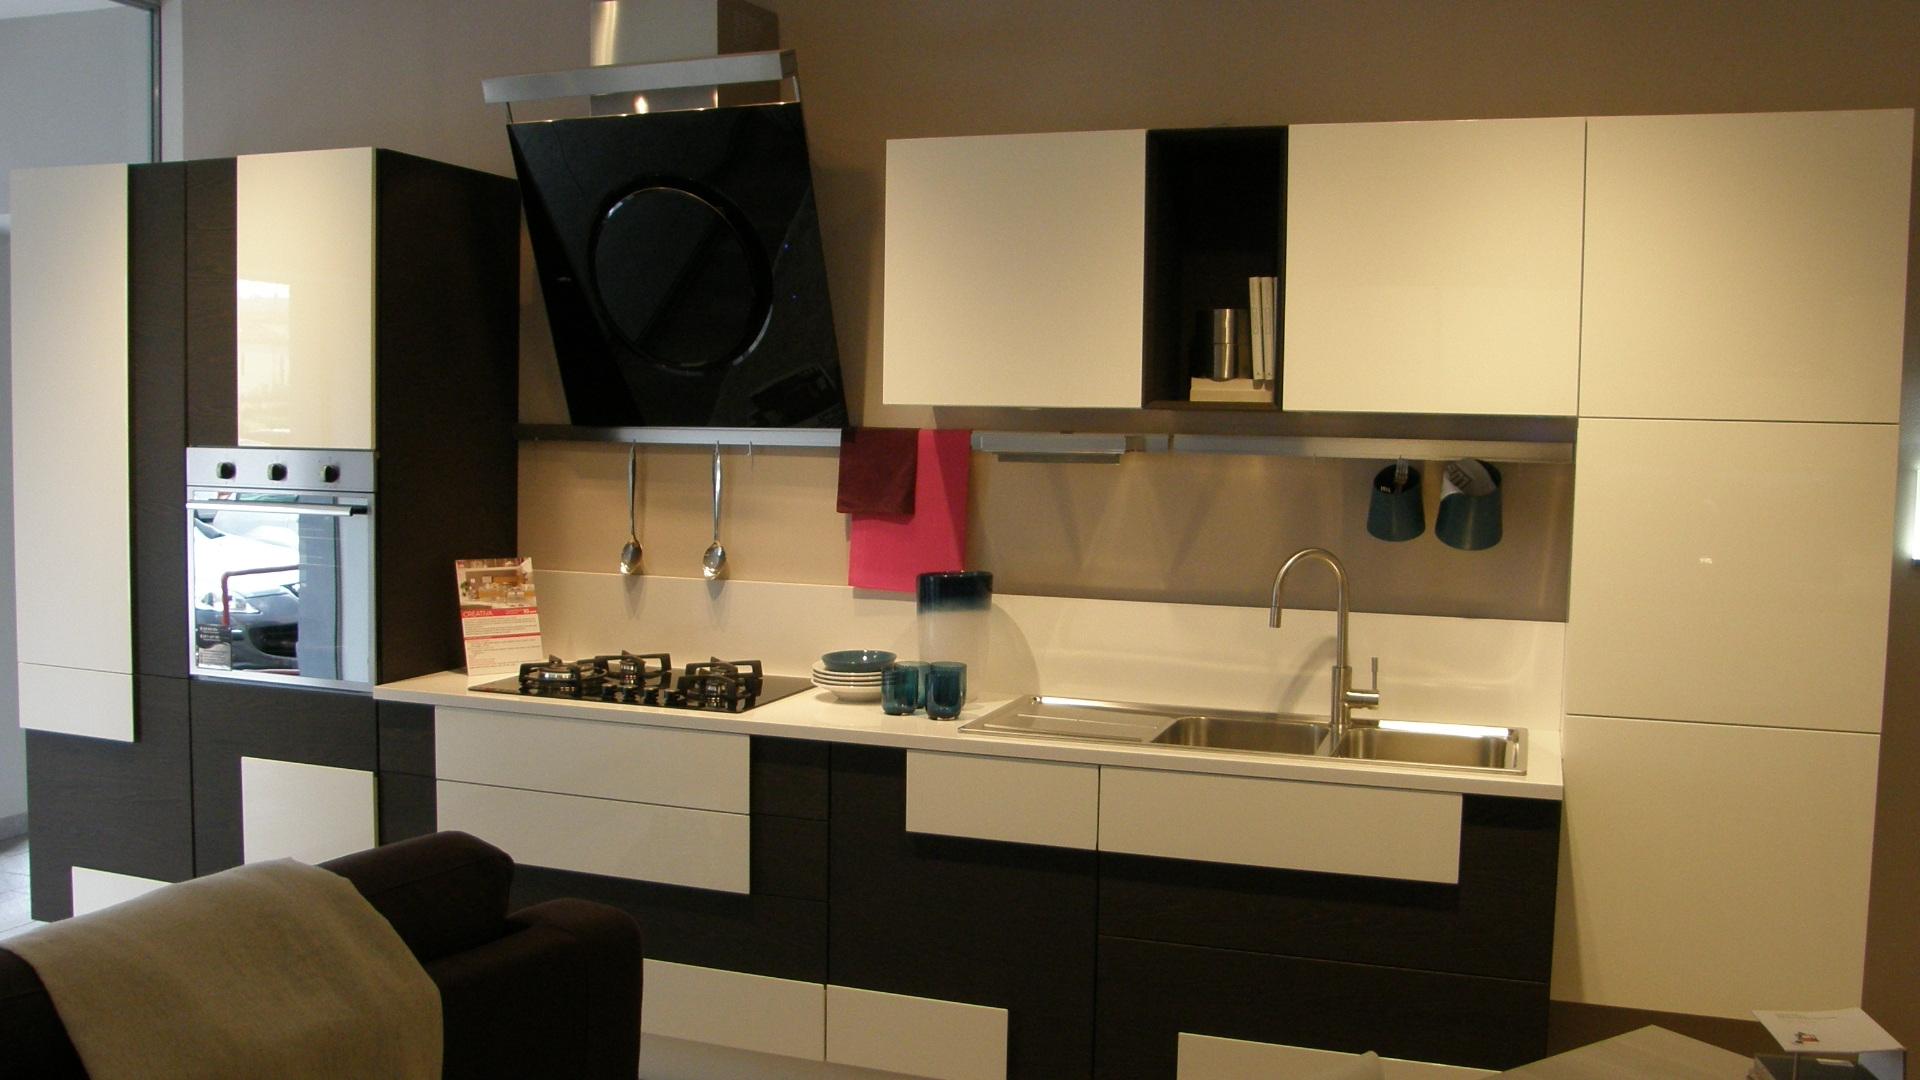 Awesome Cucina Lube Modello Alessia Photos - Home Interior Ideas ...